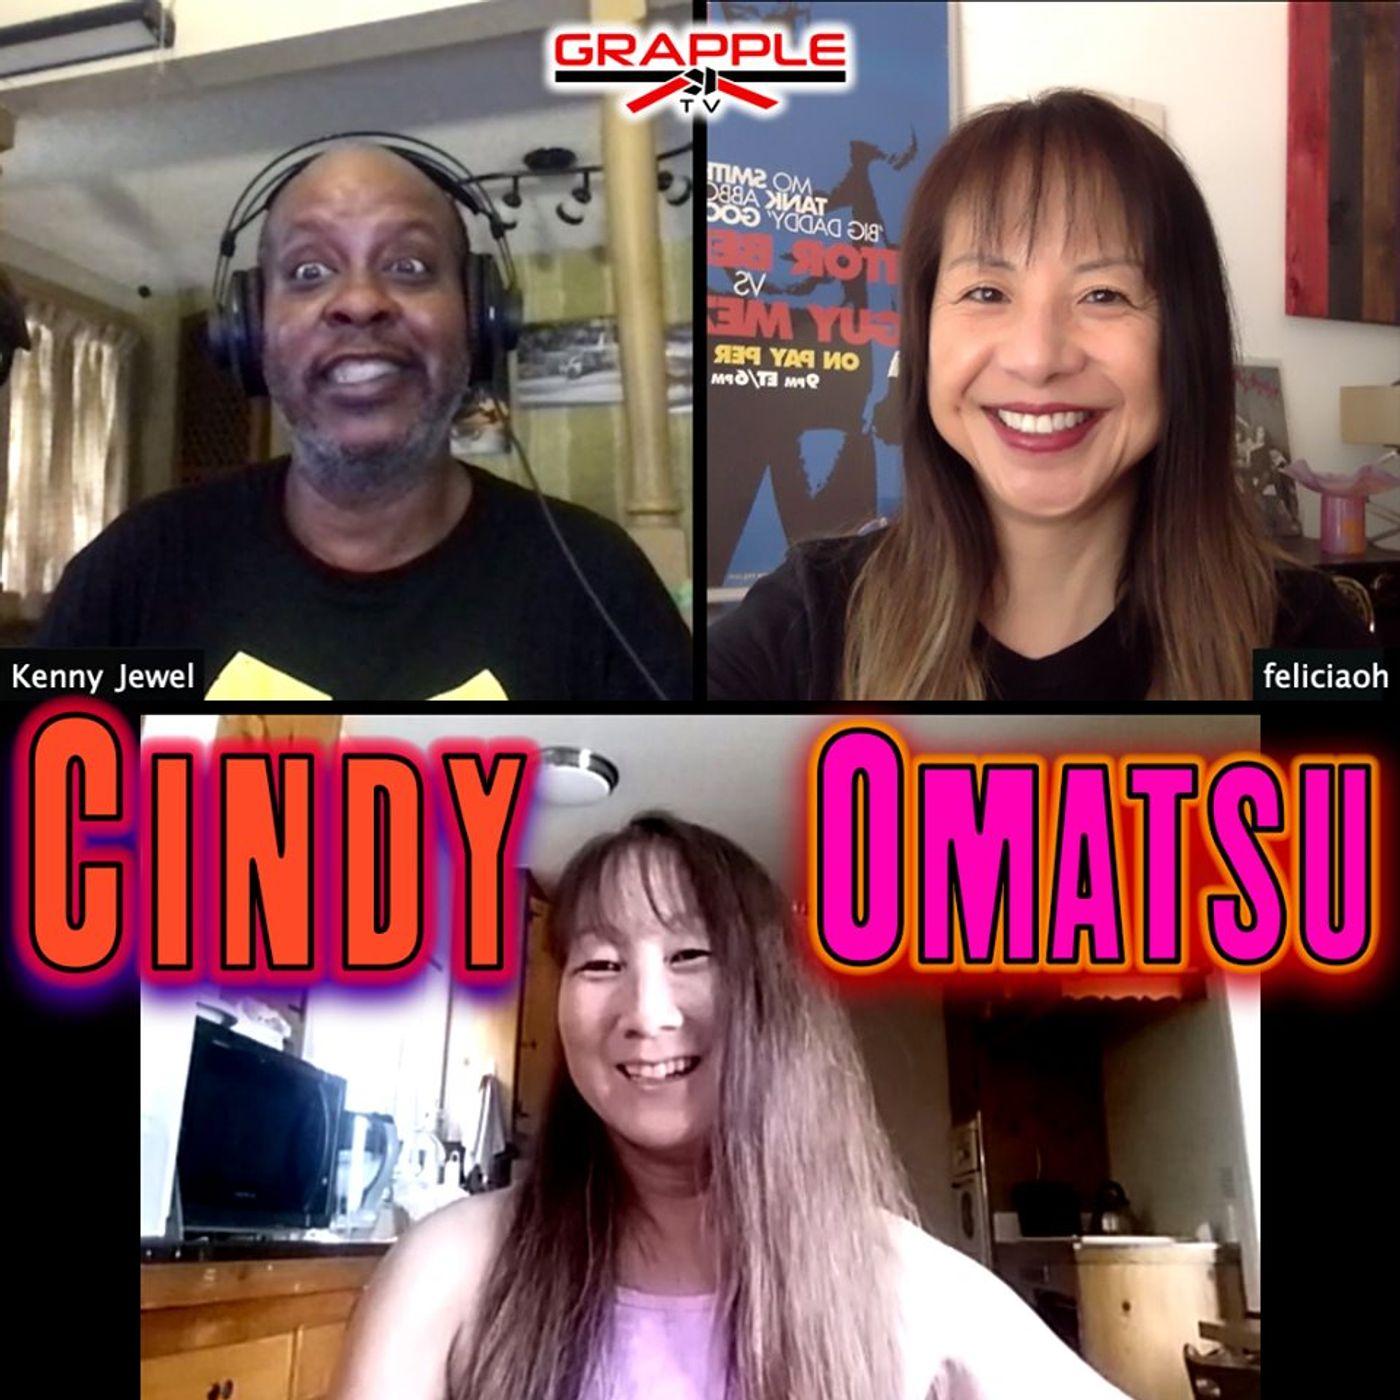 Episode 105 - Cindy Omatsu